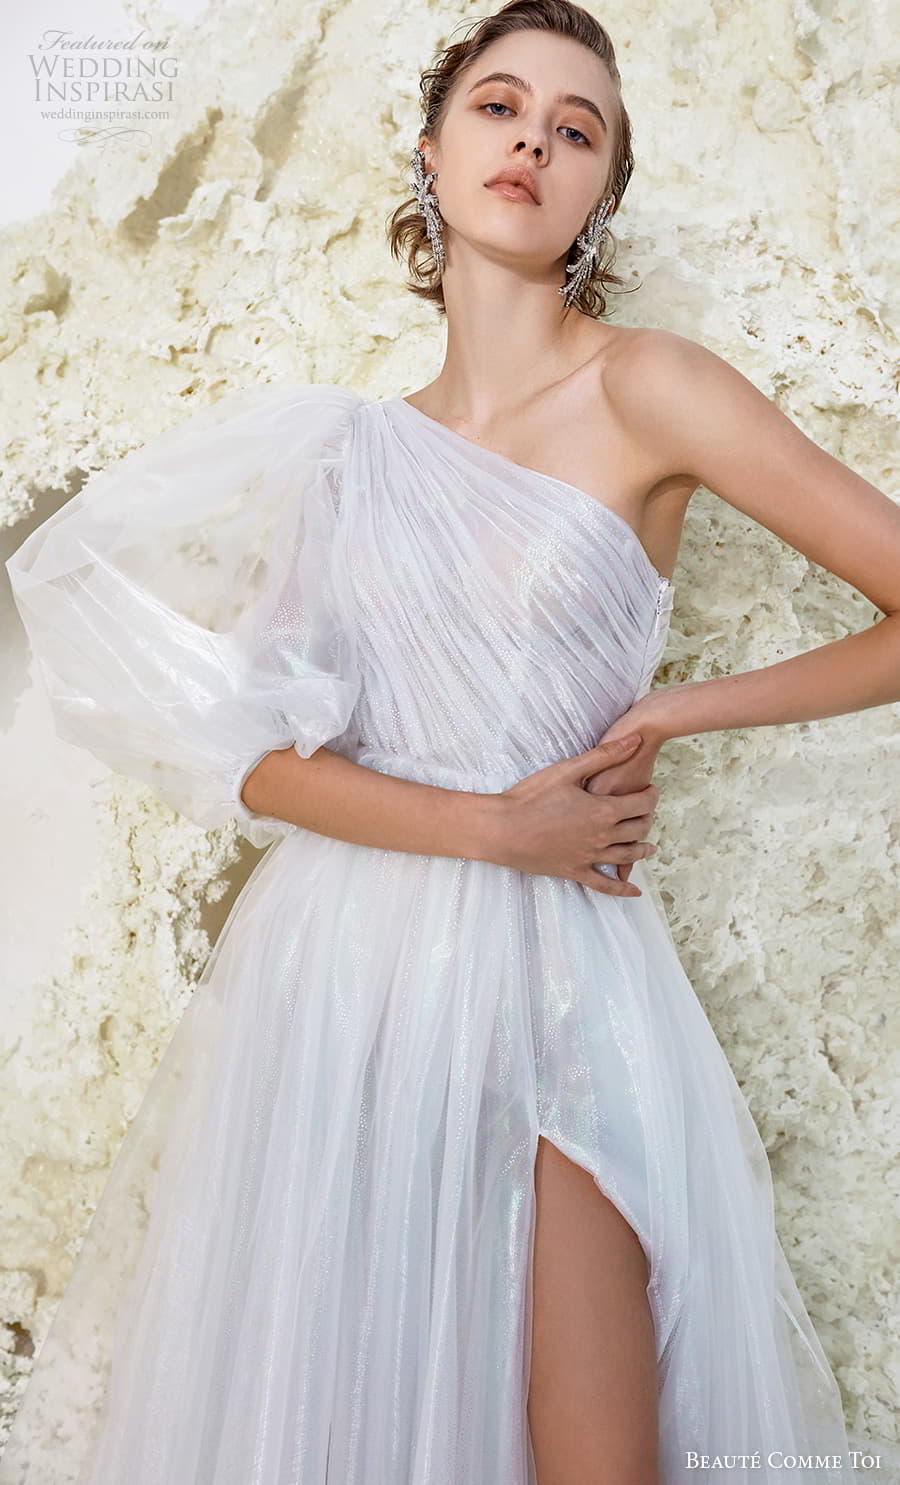 beaute comme toi spring 2022 bridal one shoulder three quarter bishop sleeves ruched bodice glitter elegant a line wedding dress slit skirt chapel train (verna) zv